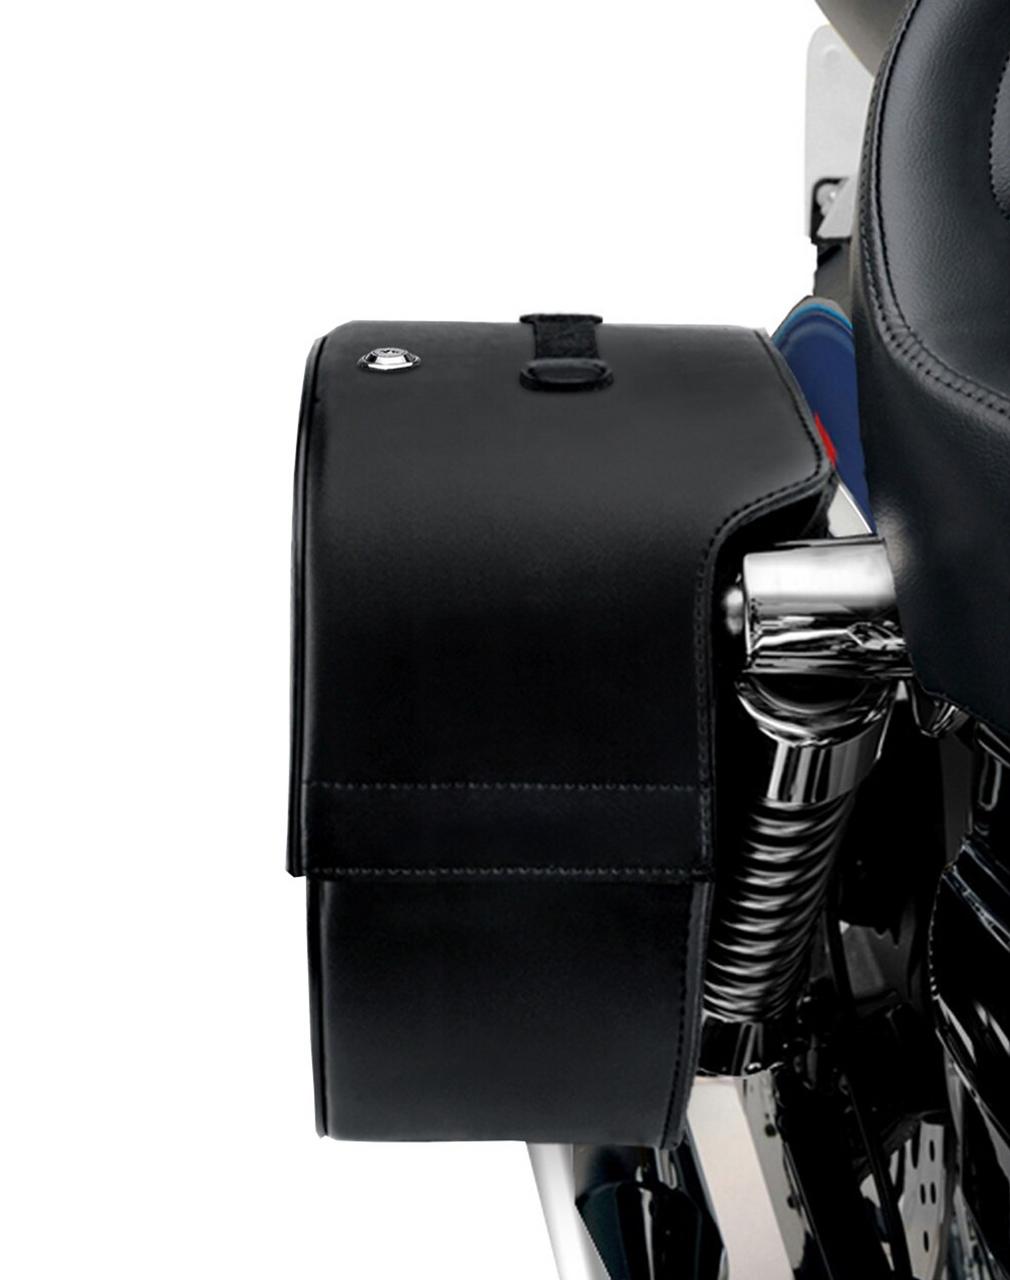 Honda 1500 Valkyrie Interstate Armor Shock Cutout Motorcycle Saddlebags Shock Cutout View